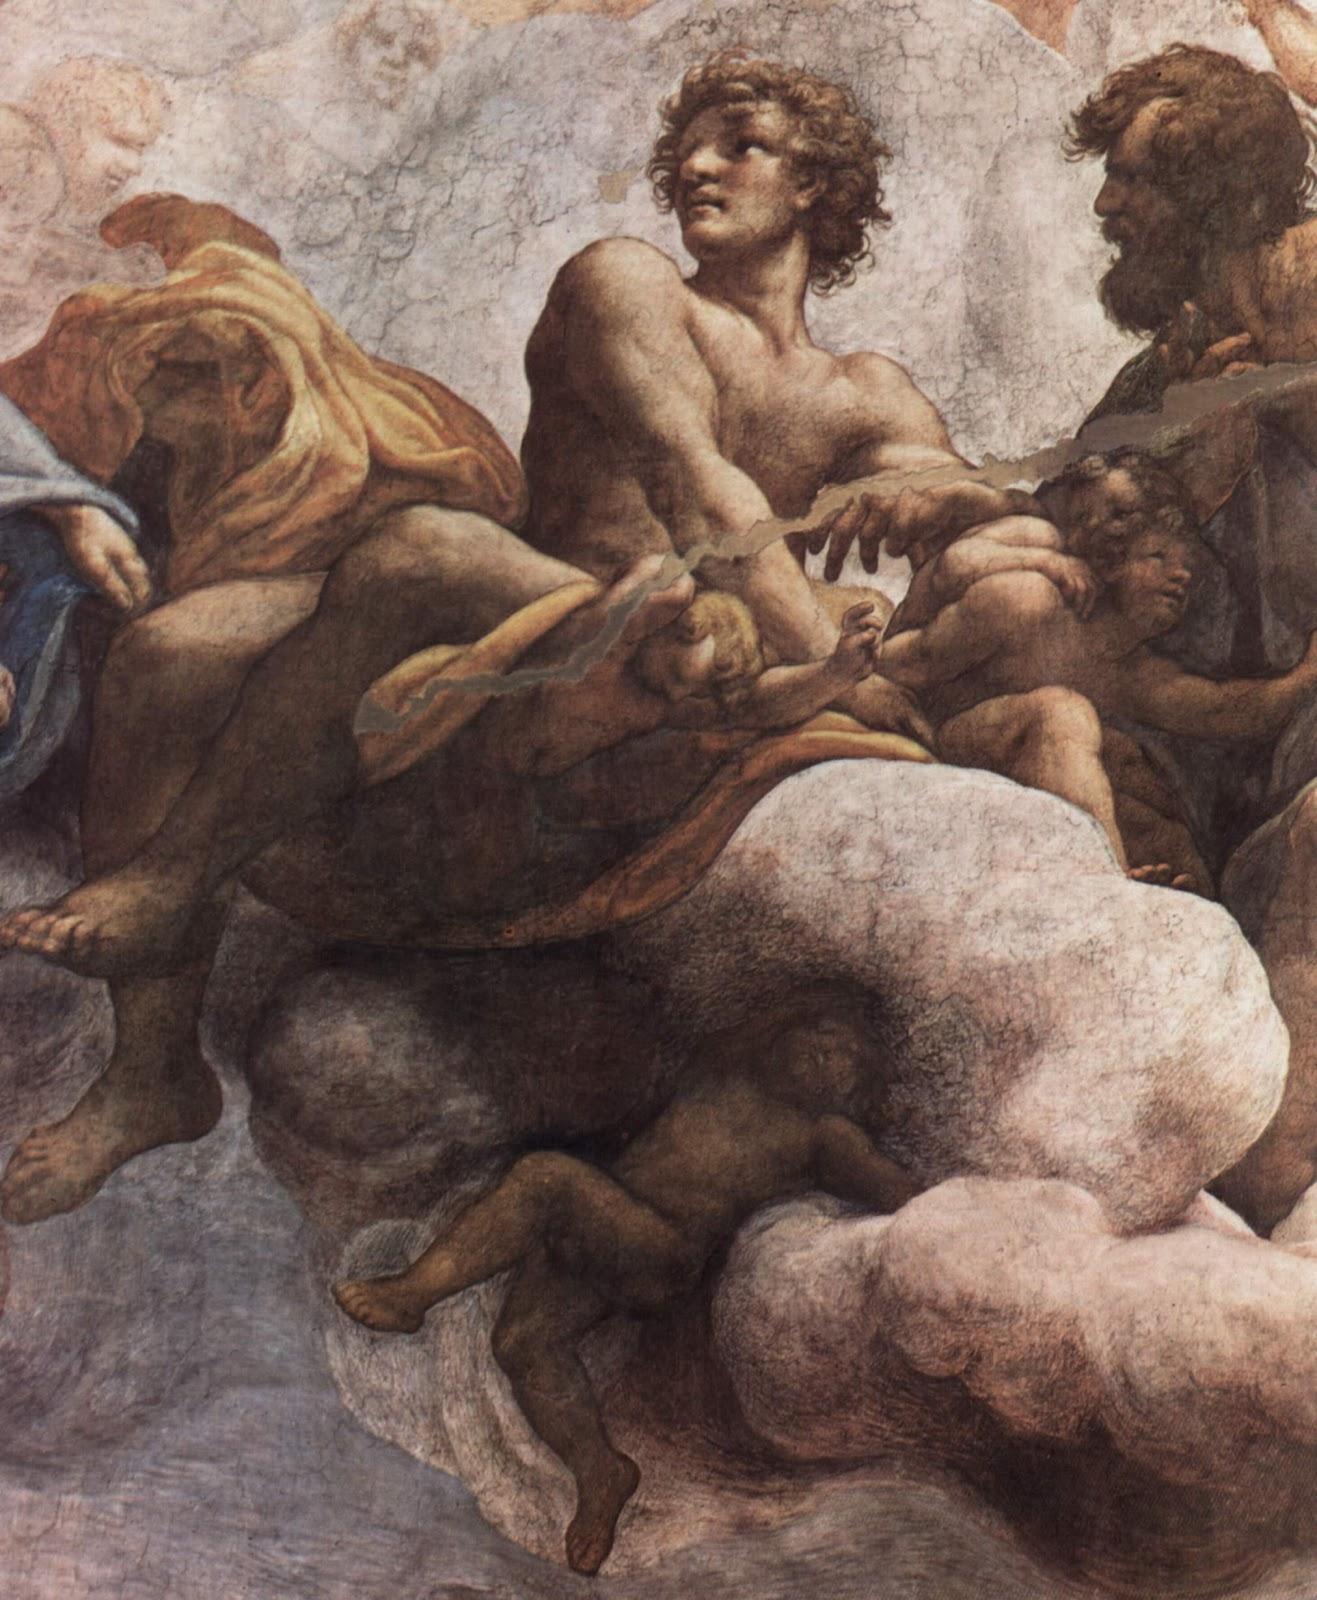 Colori In Luce Correggio correggio | high renaissance mannerism painter | tutt'art